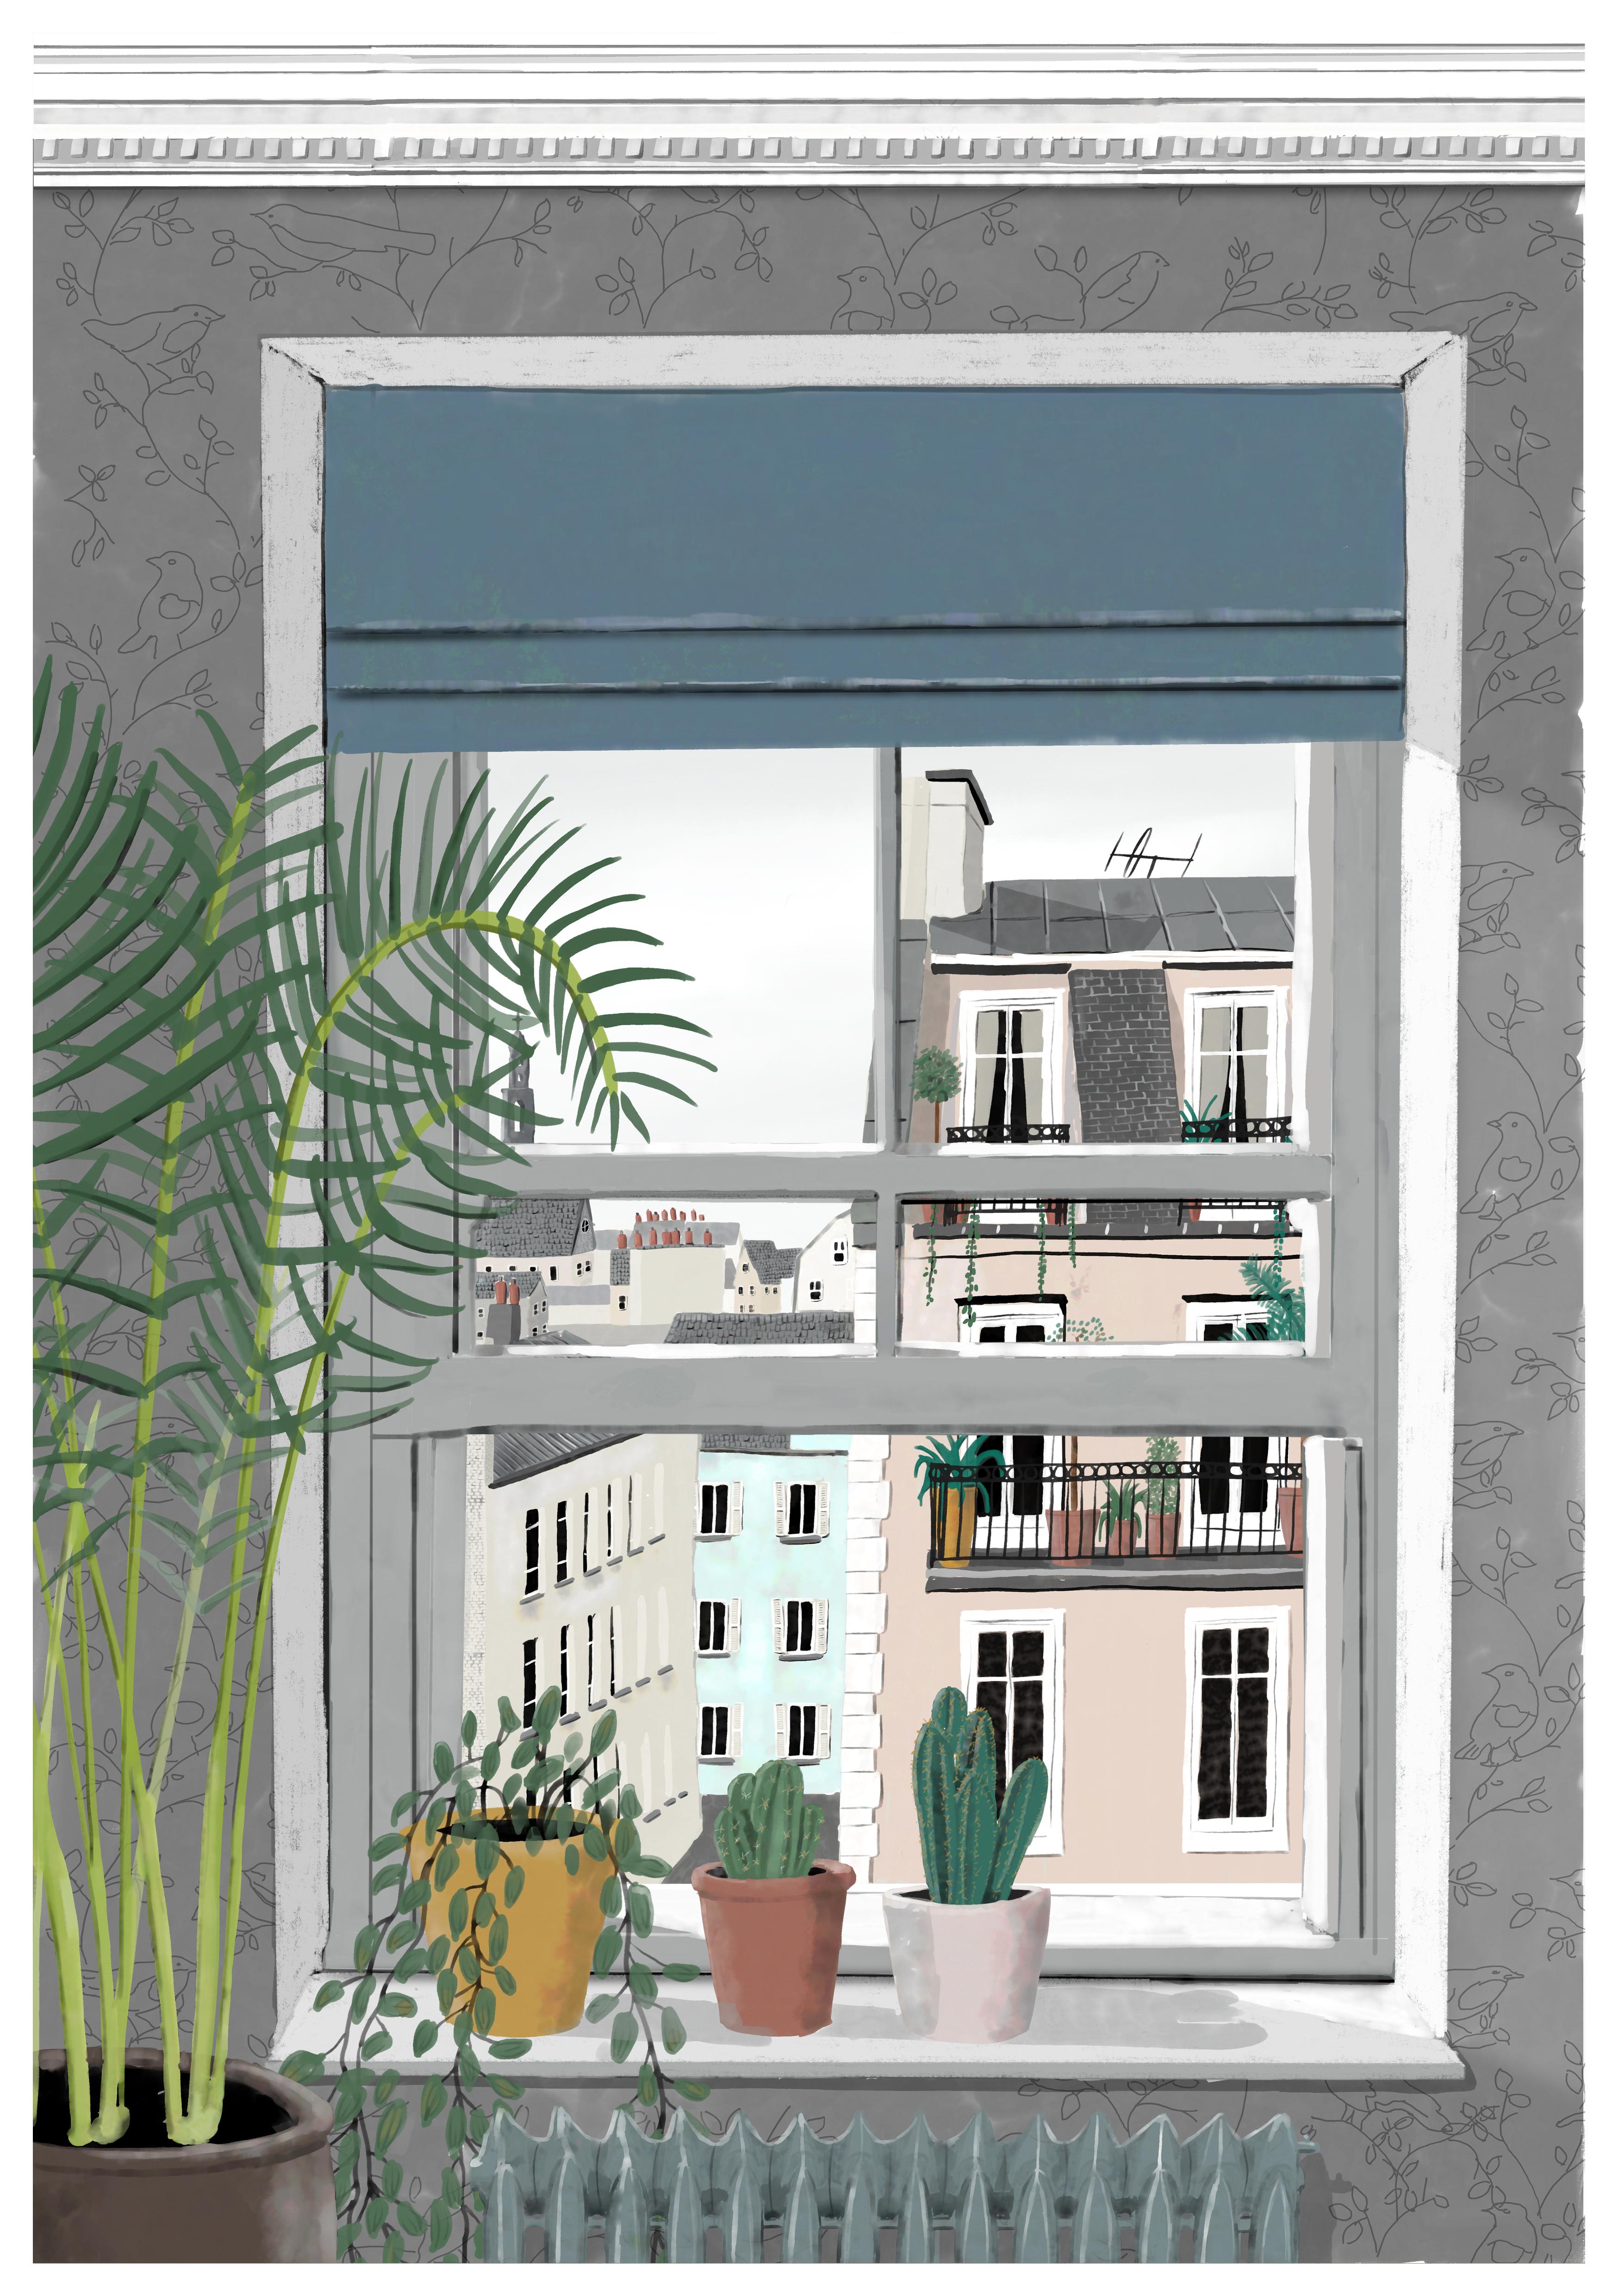 Window view-A5